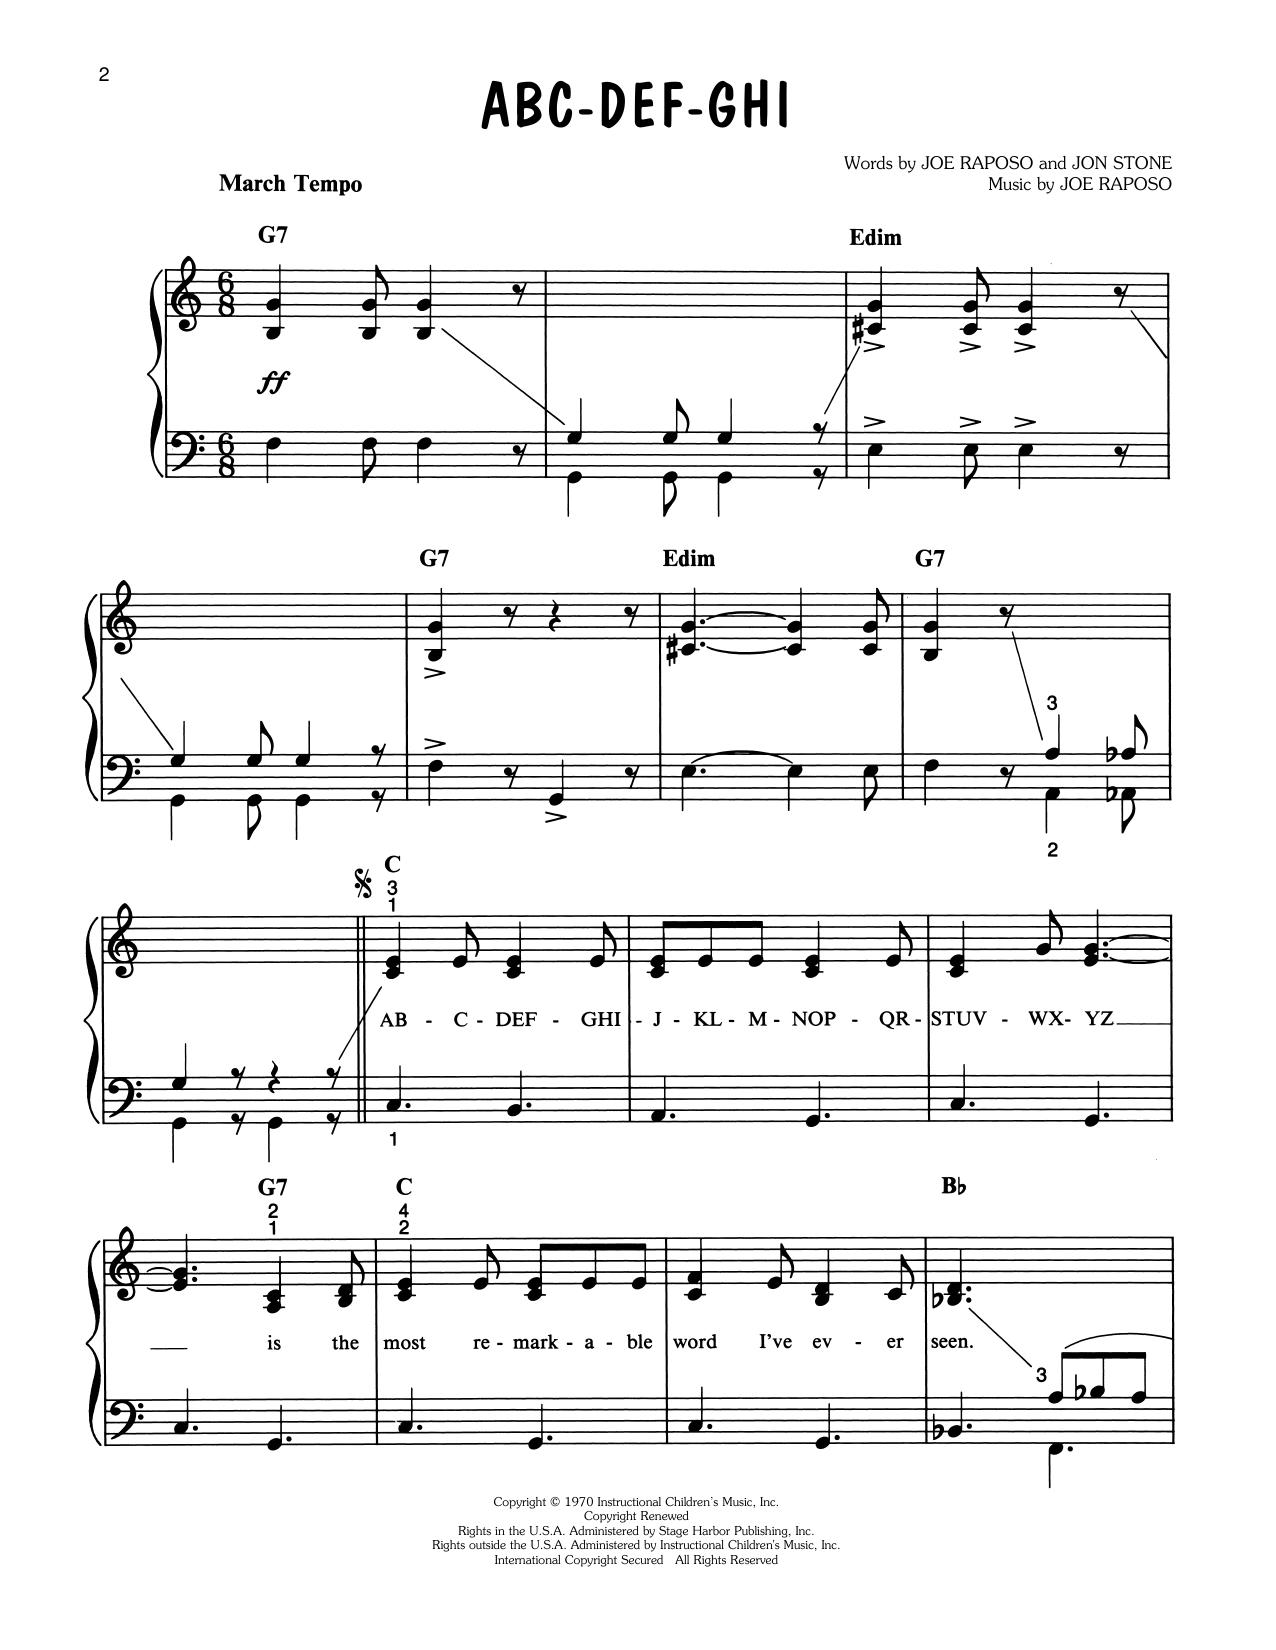 Big Bird ABC-DEF-GHI (from Sesame Street) sheet music notes printable PDF score